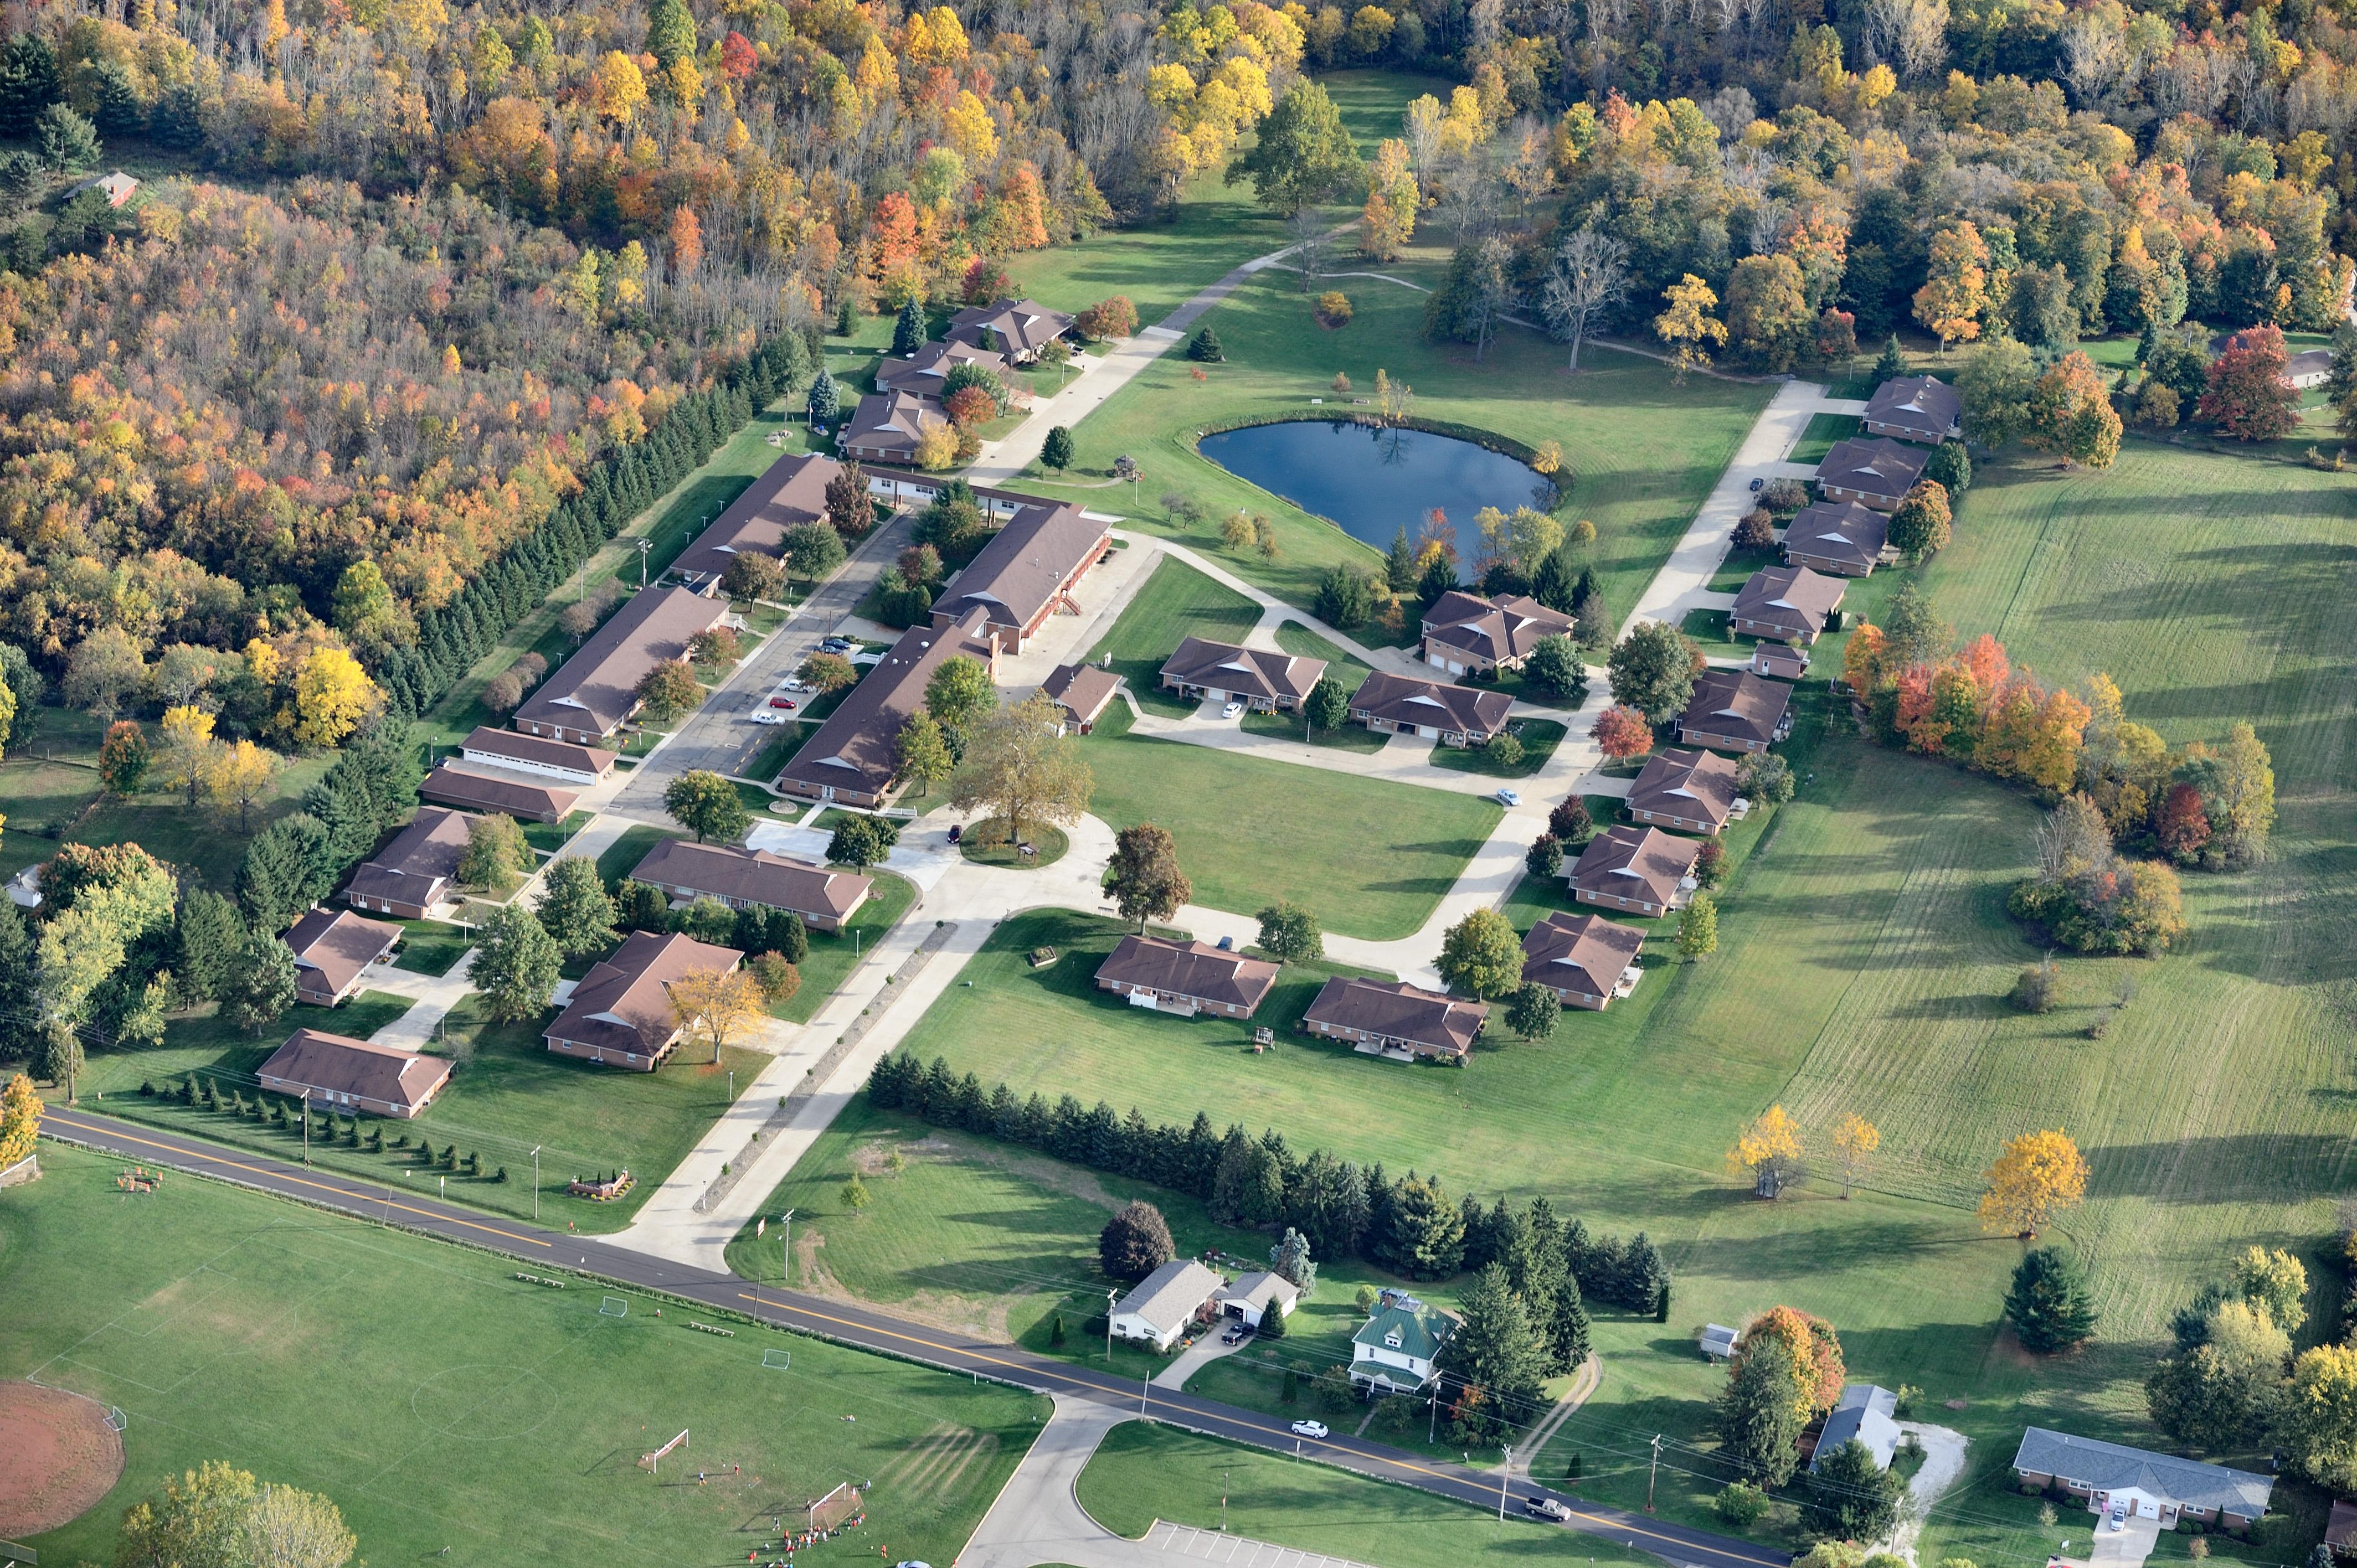 Apostolic Christian Church Rest Home – A Christian